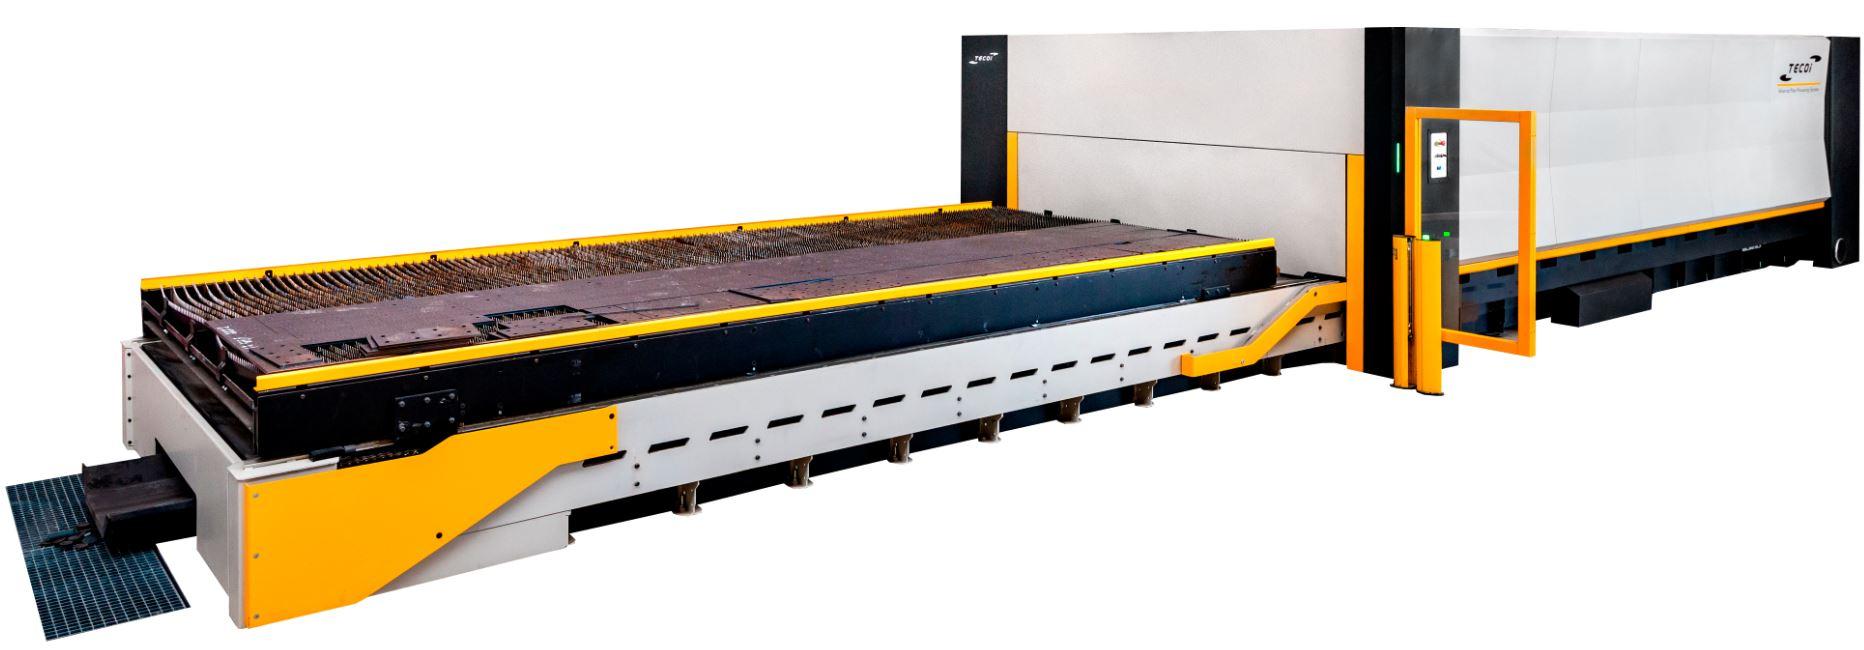 Laser cutting MB-L